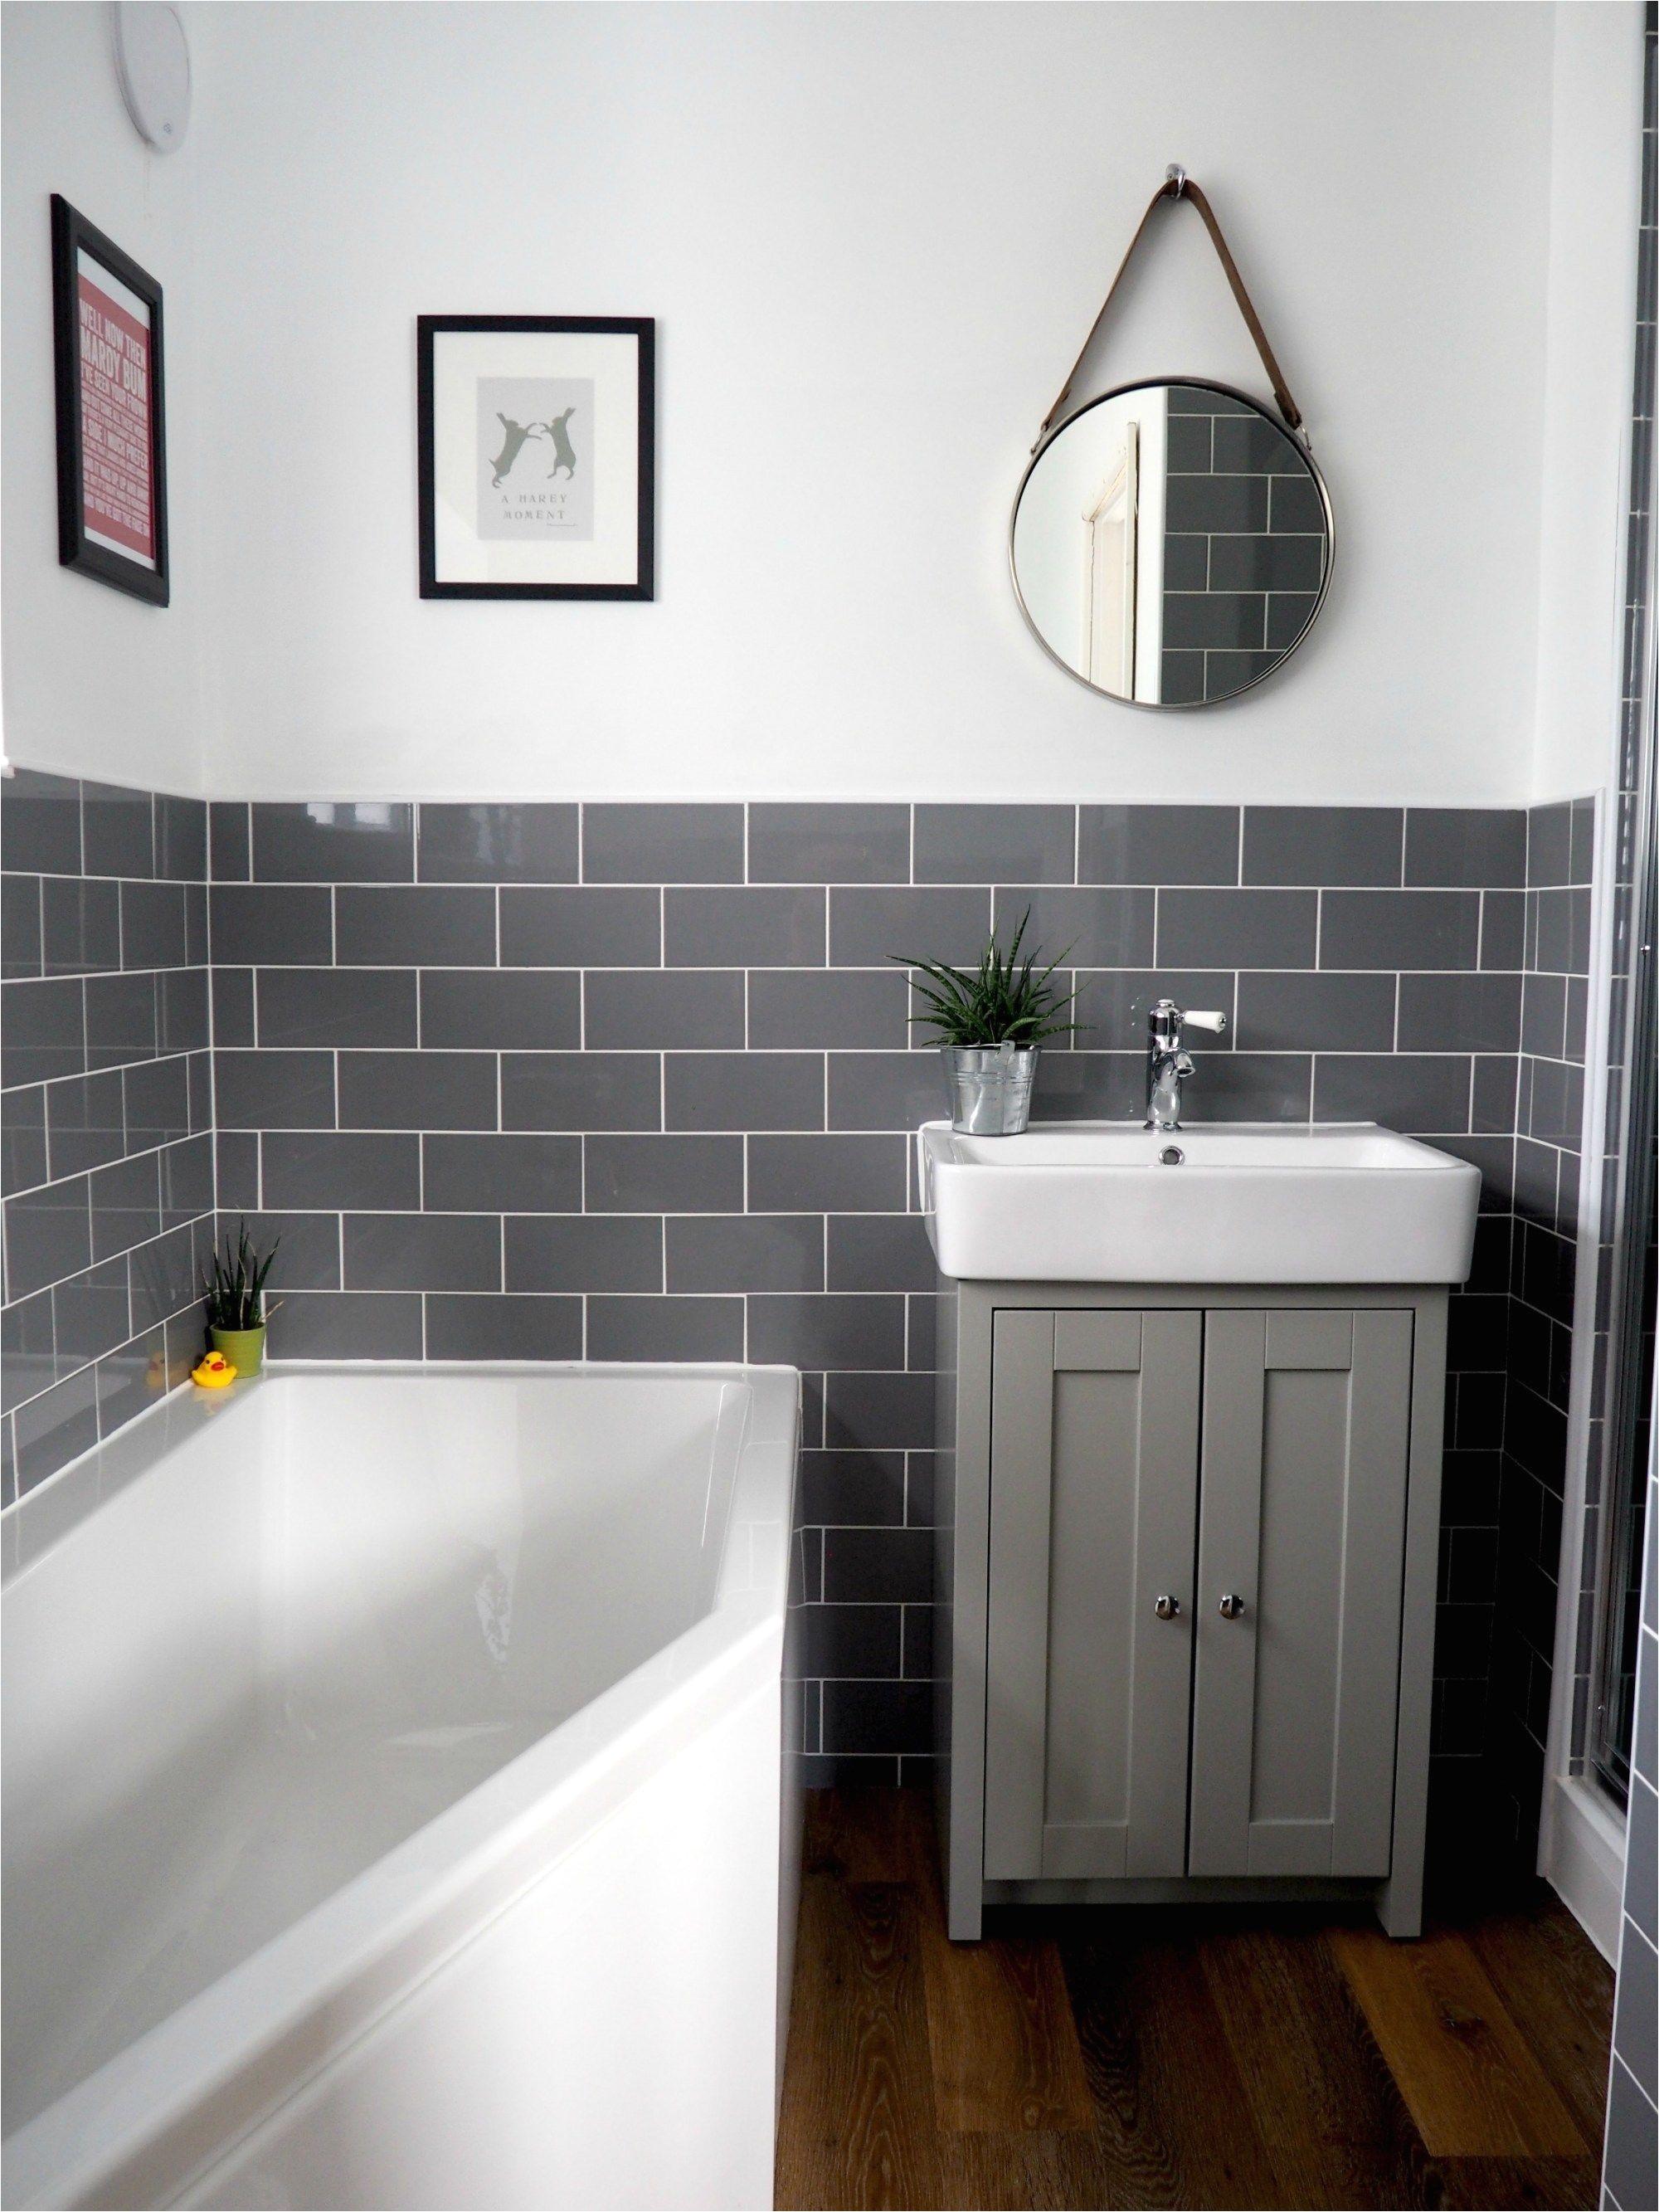 Basement Bathroom Design Ideas Marvelous Cost to Redo A Small Bathroom